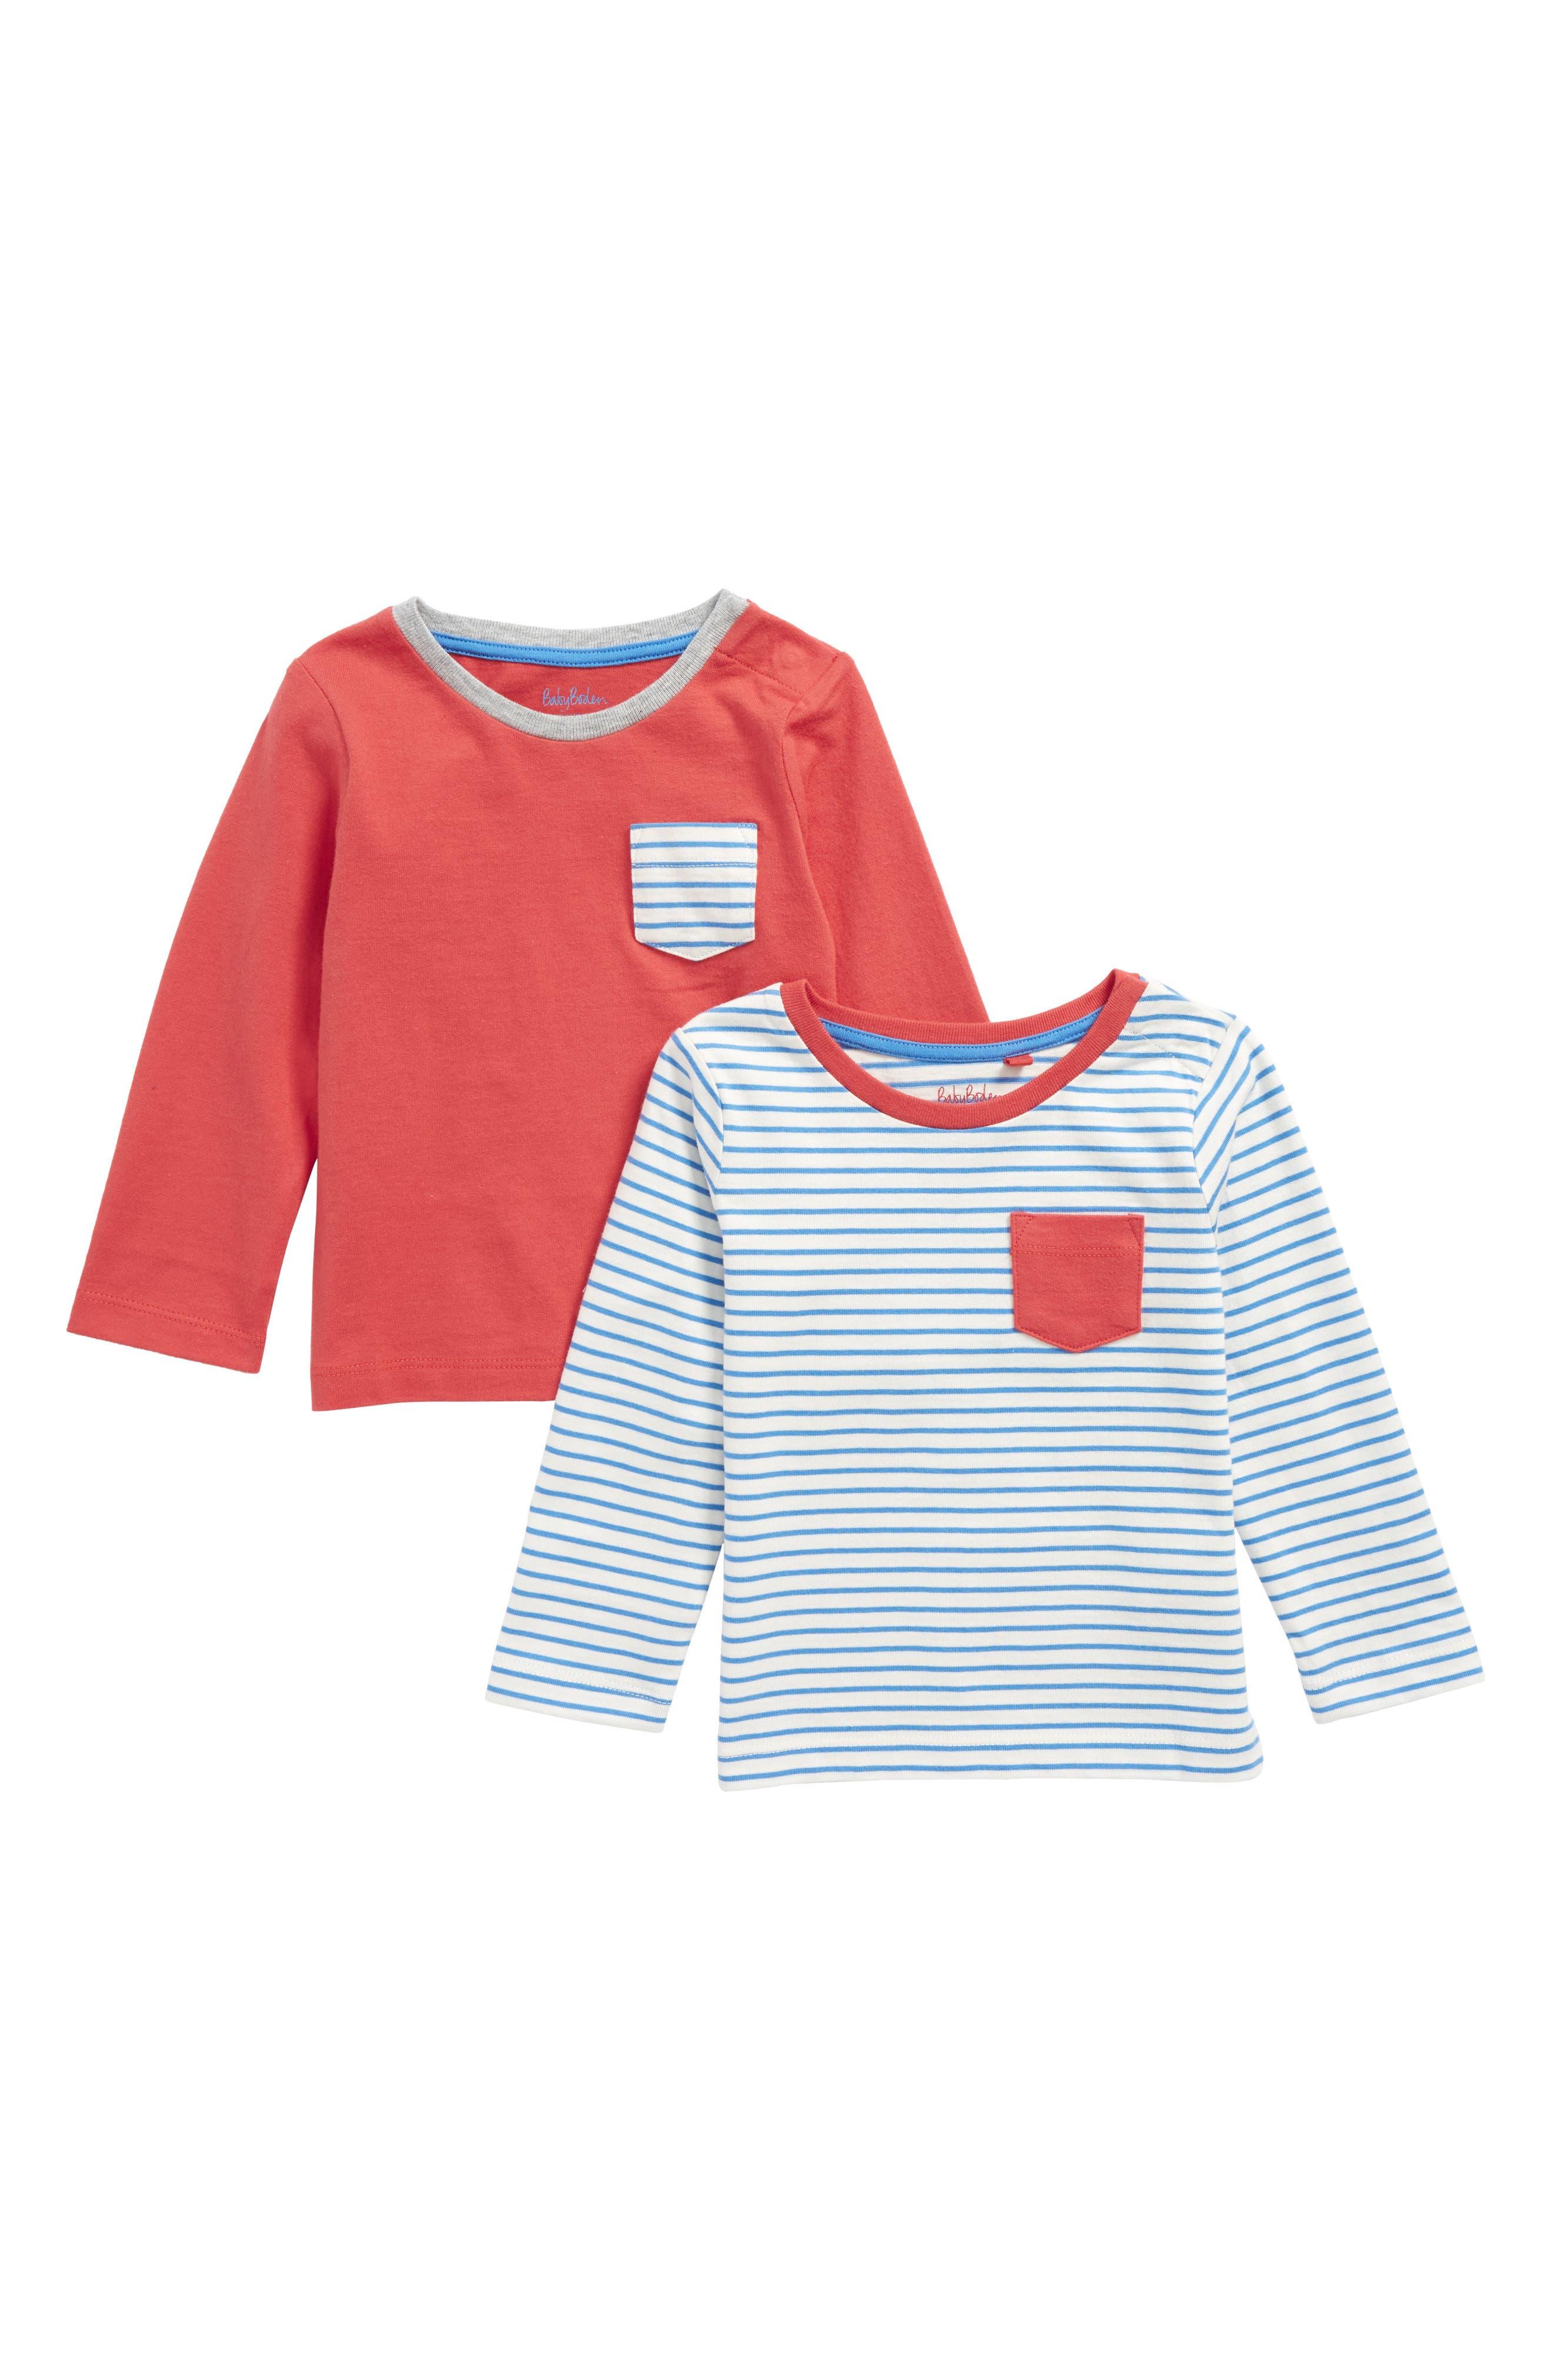 2-Pack Organic Cotton T-Shirts,                             Main thumbnail 1, color,                             424